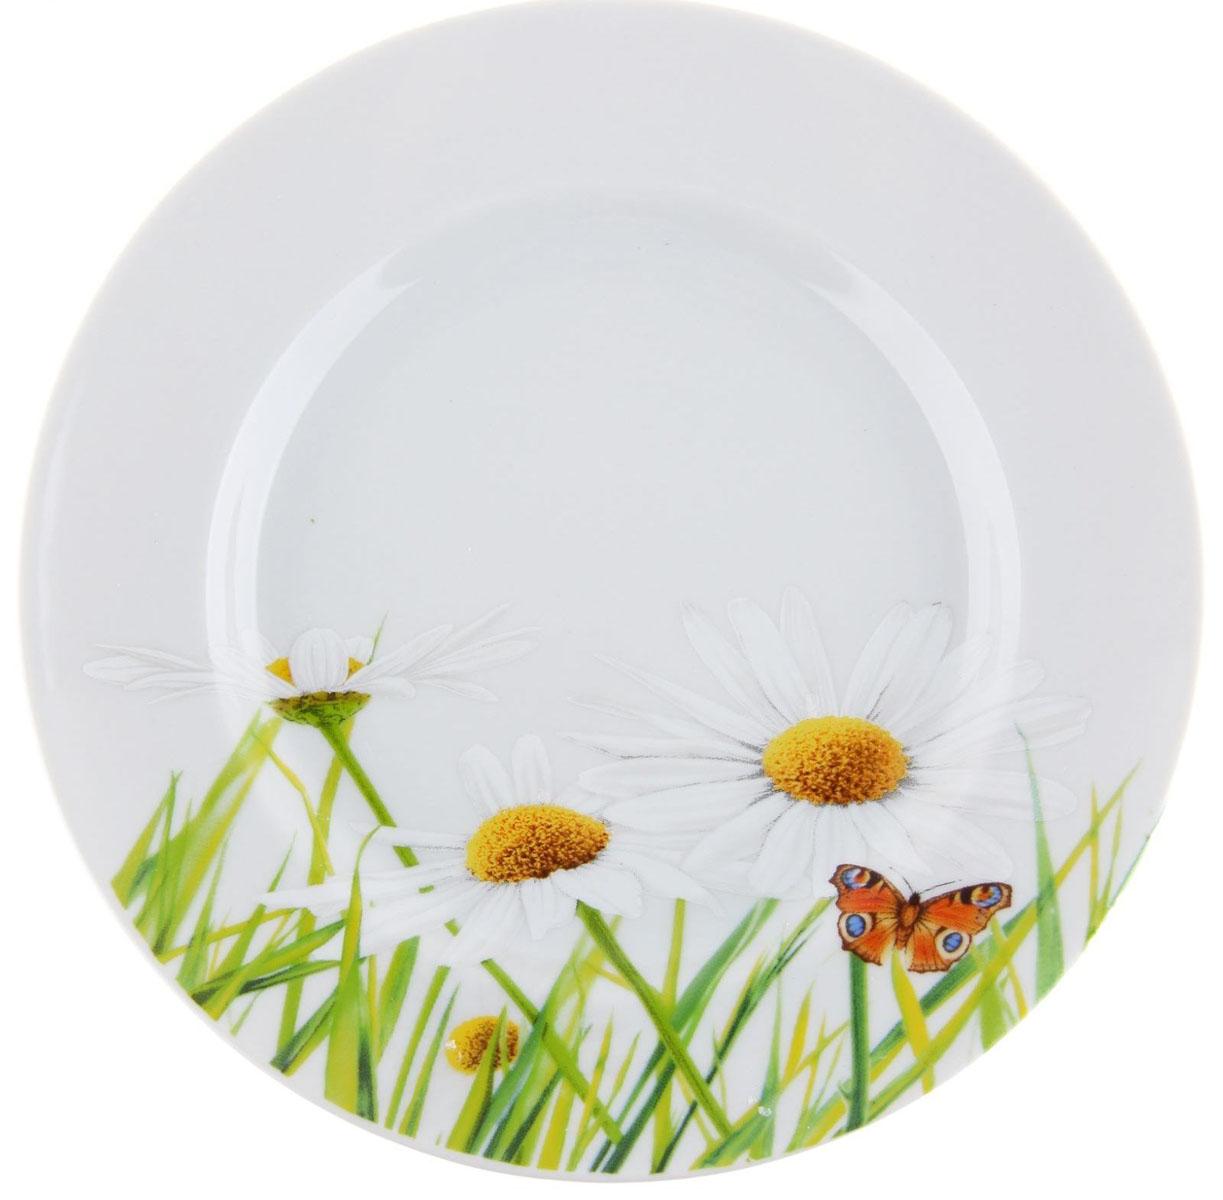 Тарелка мелкая Идиллия. Ромашка, диаметр 20 см1280310